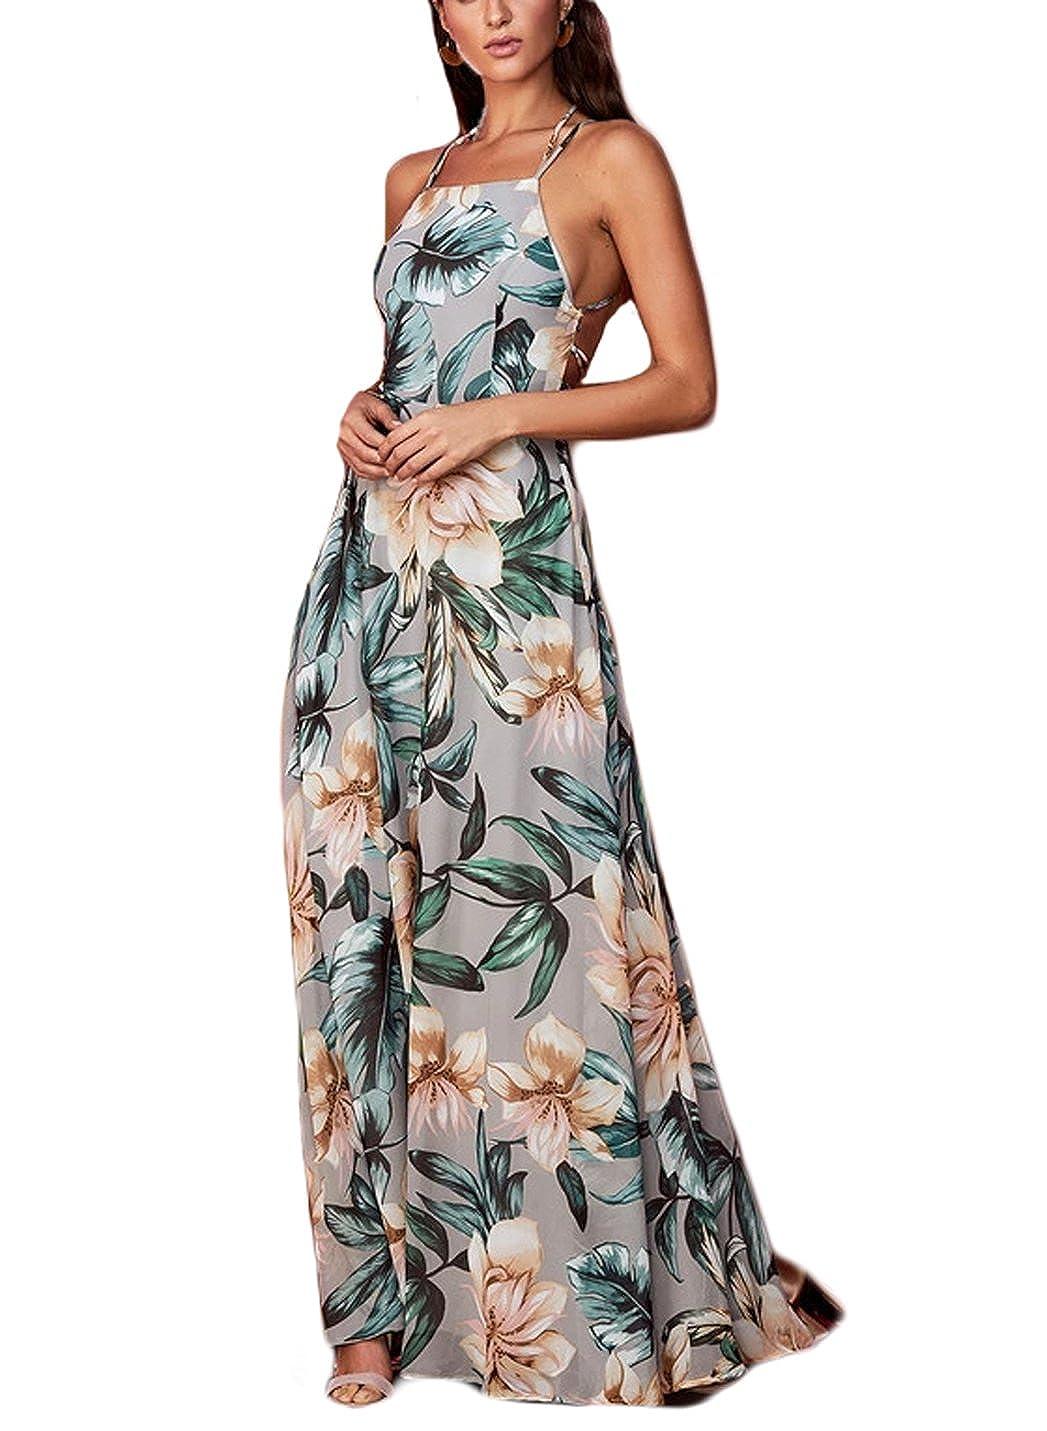 27b57245c5b NERLEROLIAN Women s Sleeveless Halter Neck Sexy Floral Print Maxi Casual  Dress for Autumn at Amazon Women s Clothing store